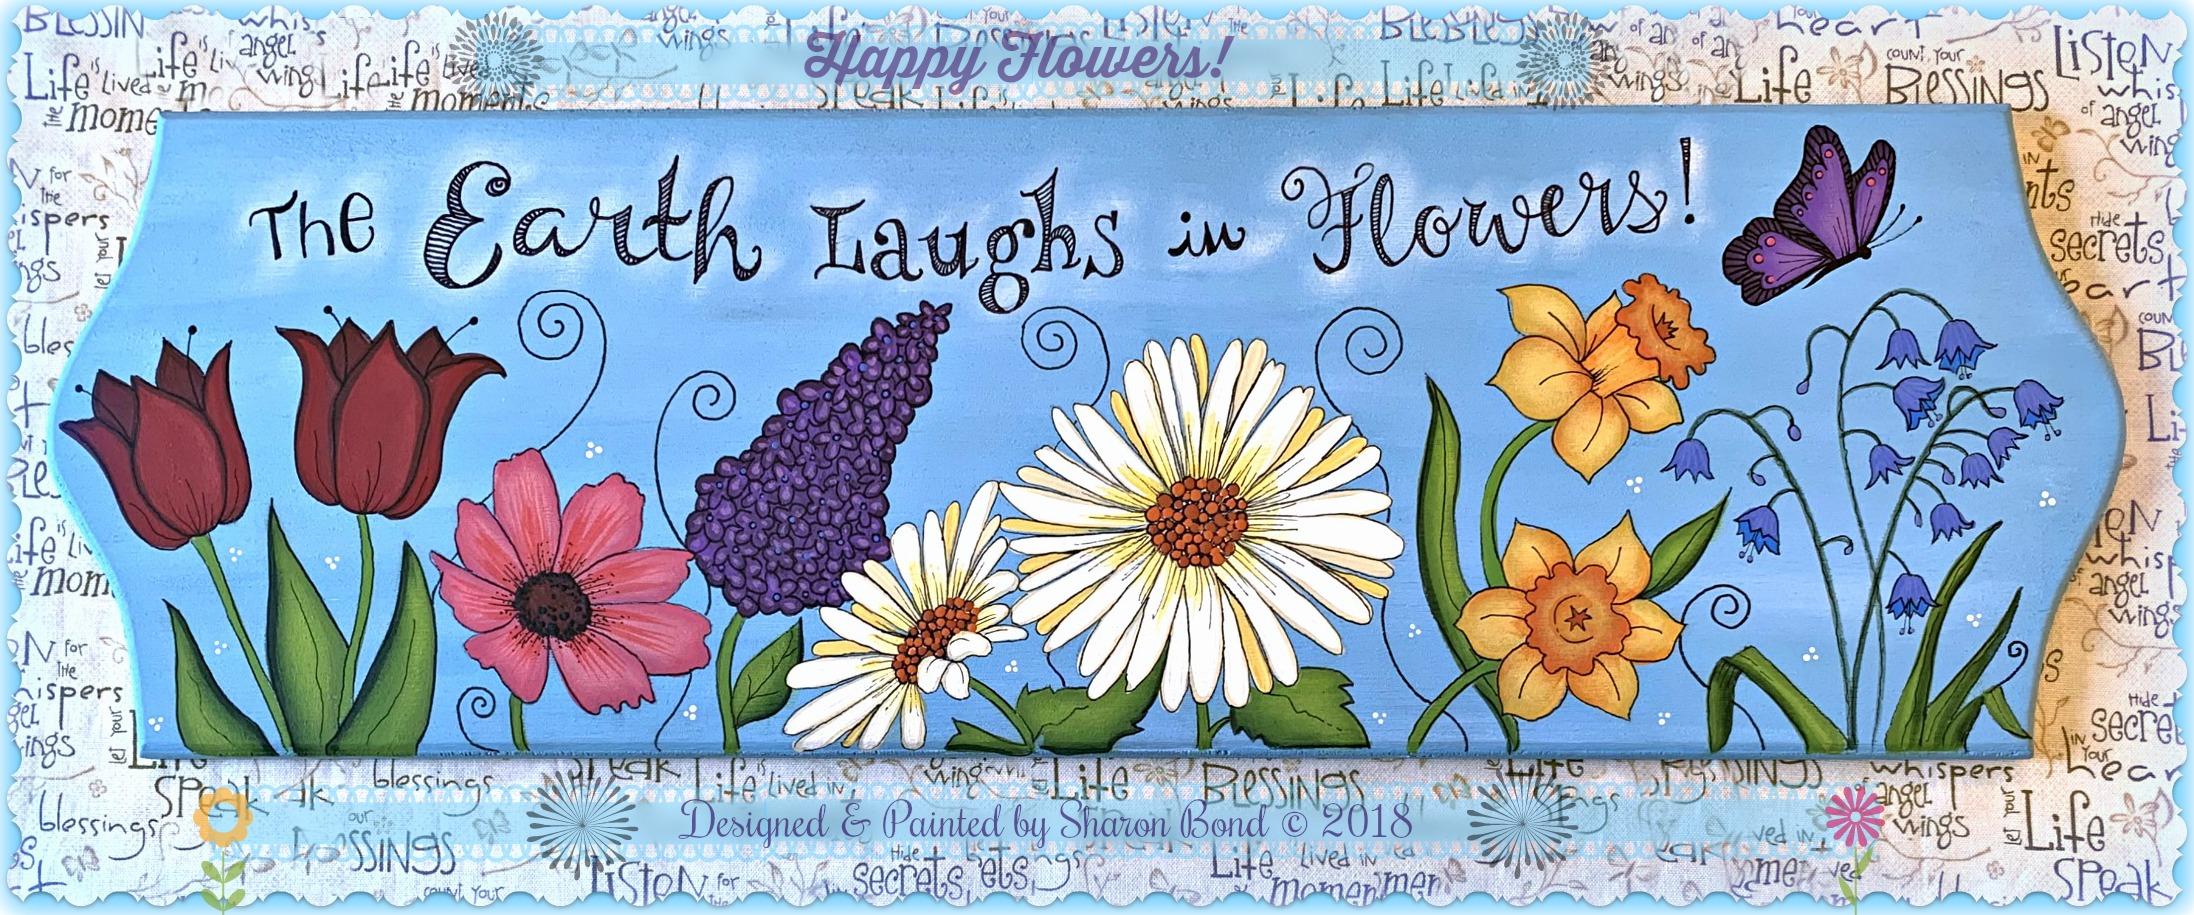 Happy Flowers! - E-Packet - Sharon Bond